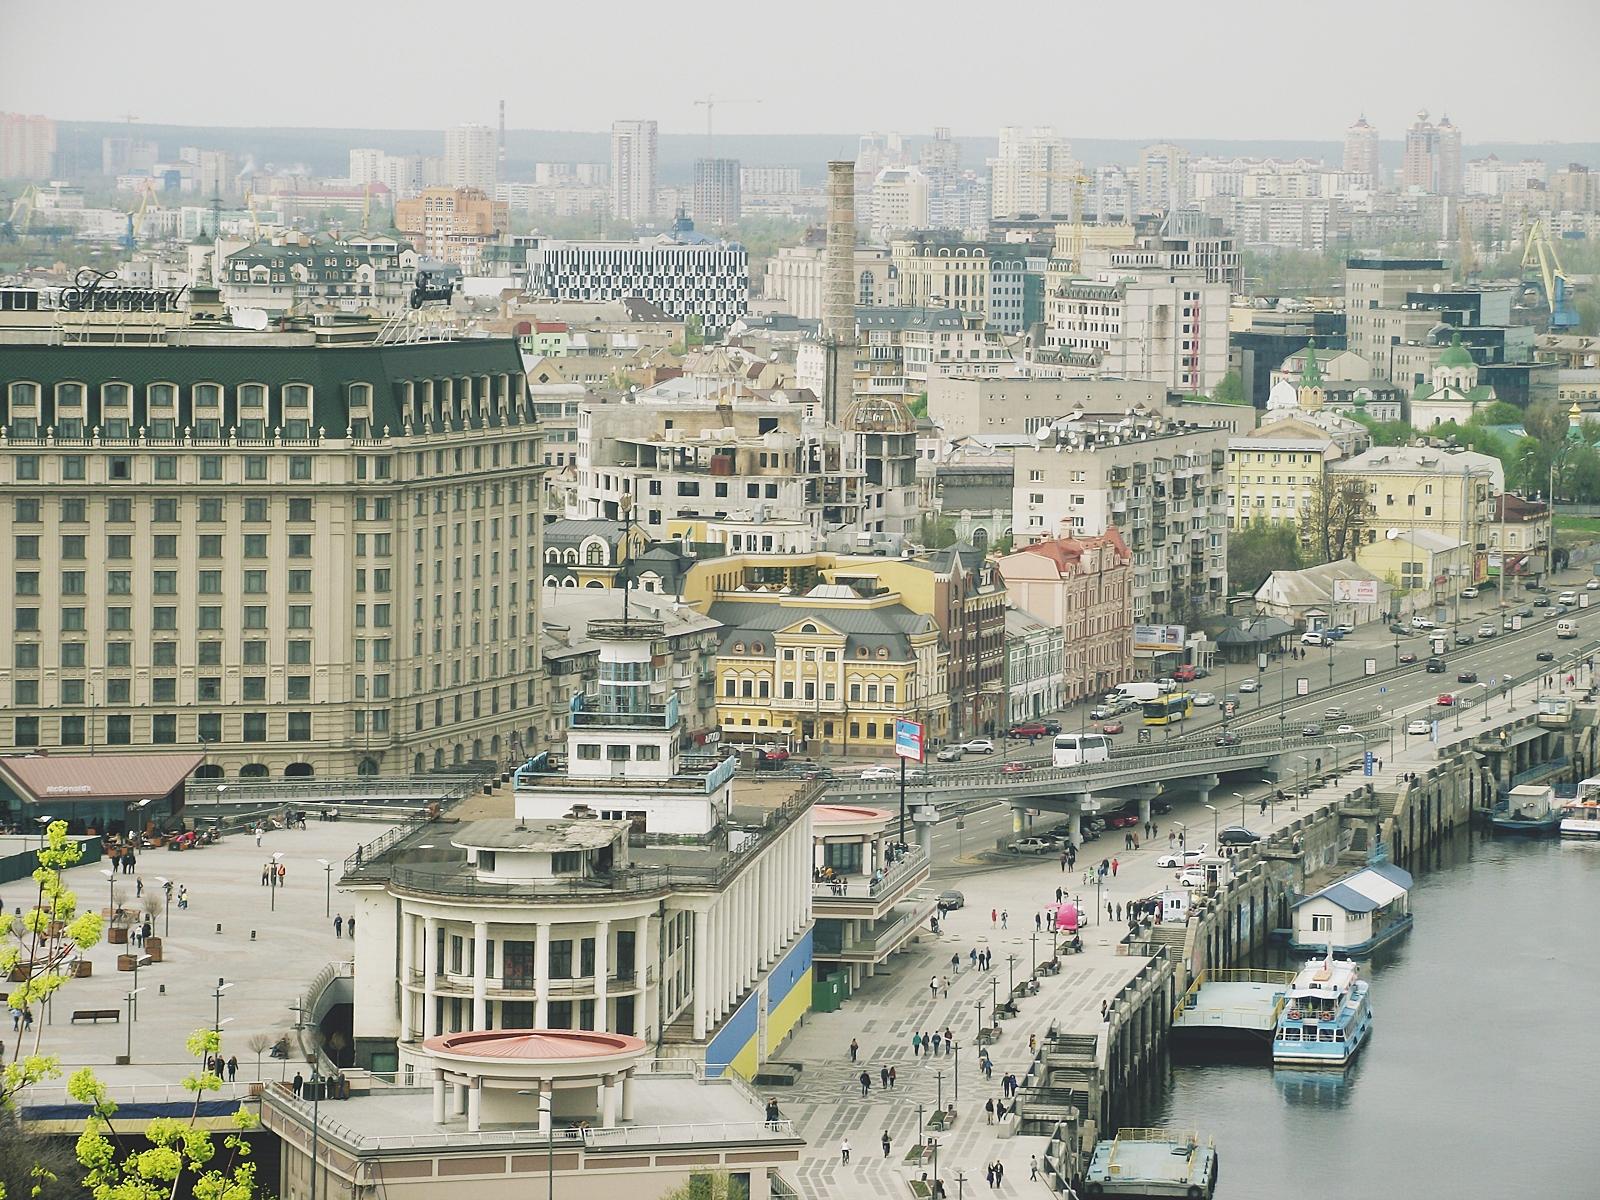 Город на днепровских холмах